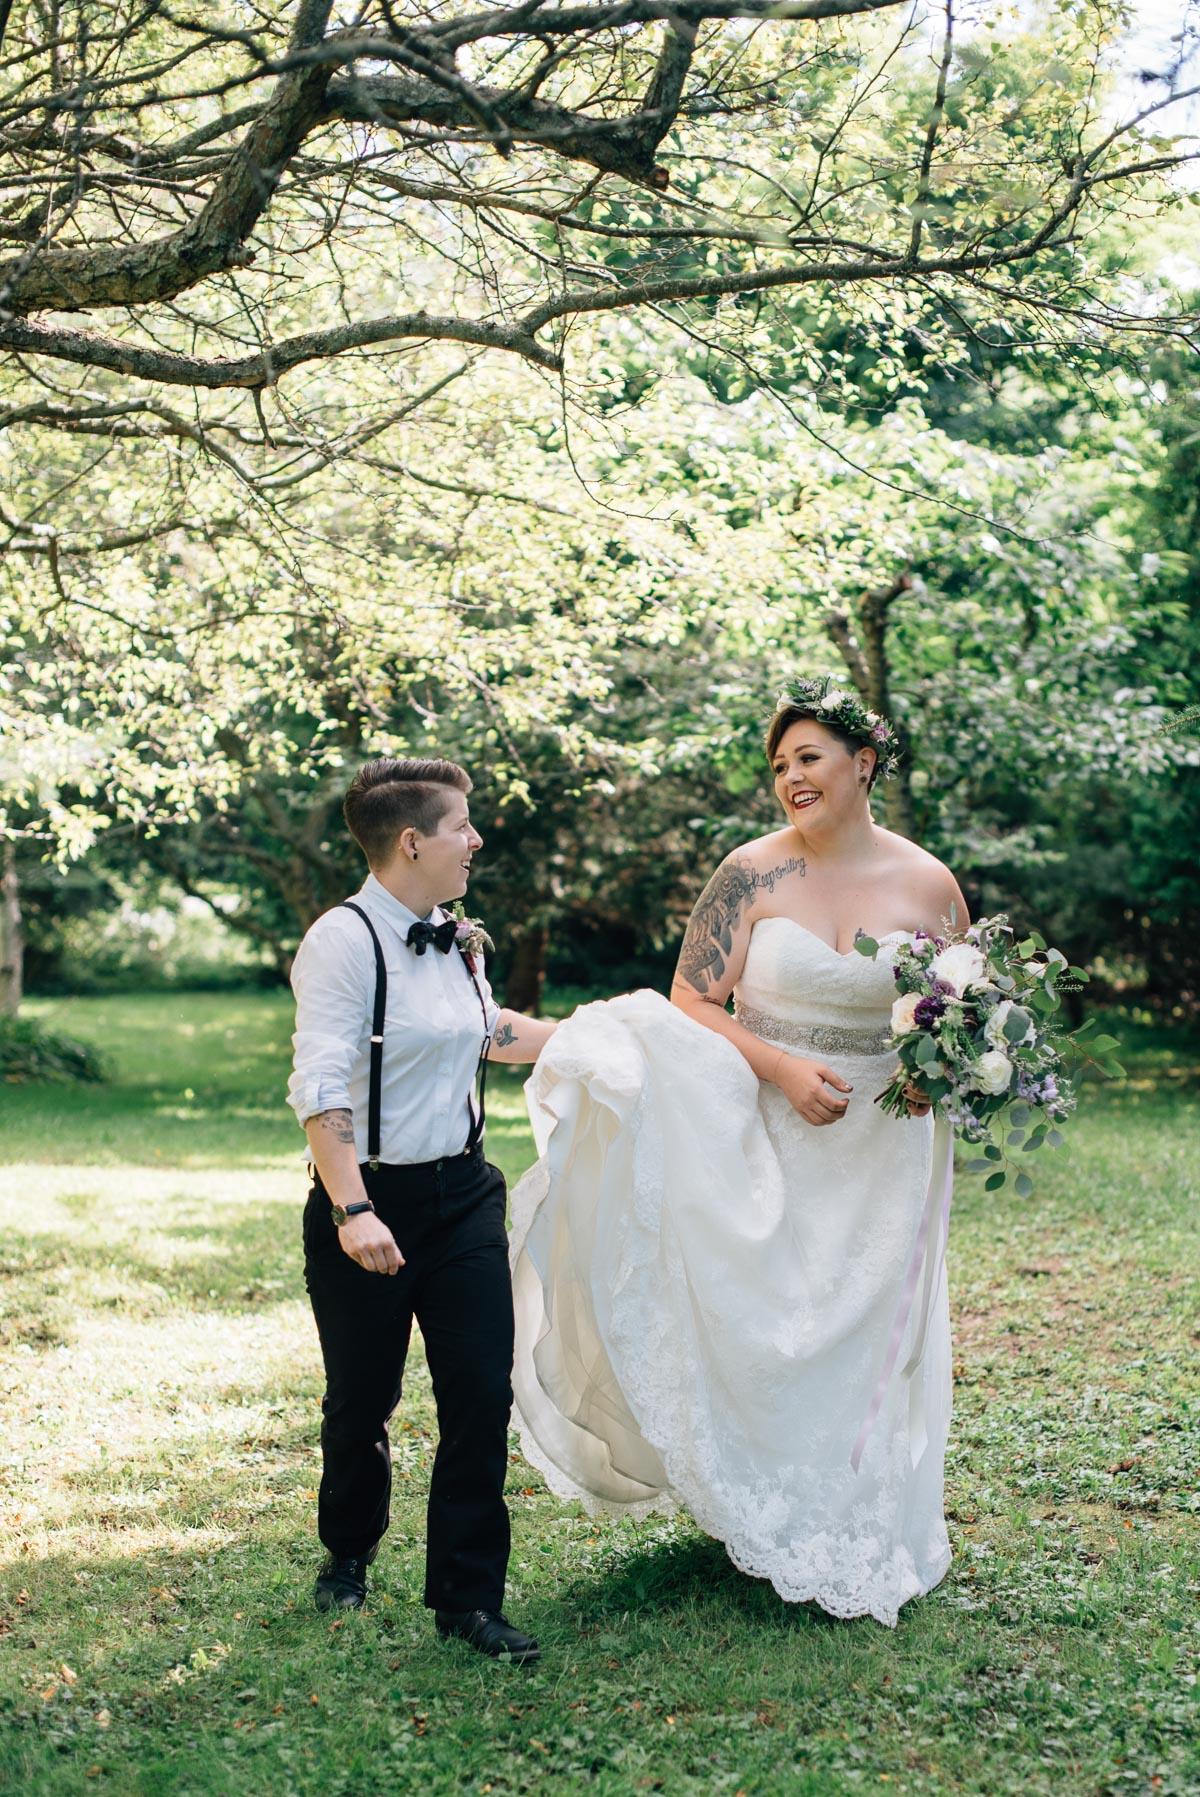 sara-wilde-photography-vineyard-bride-swish-list-beamer-falls-manor-grimsby-wedding-51.jpg